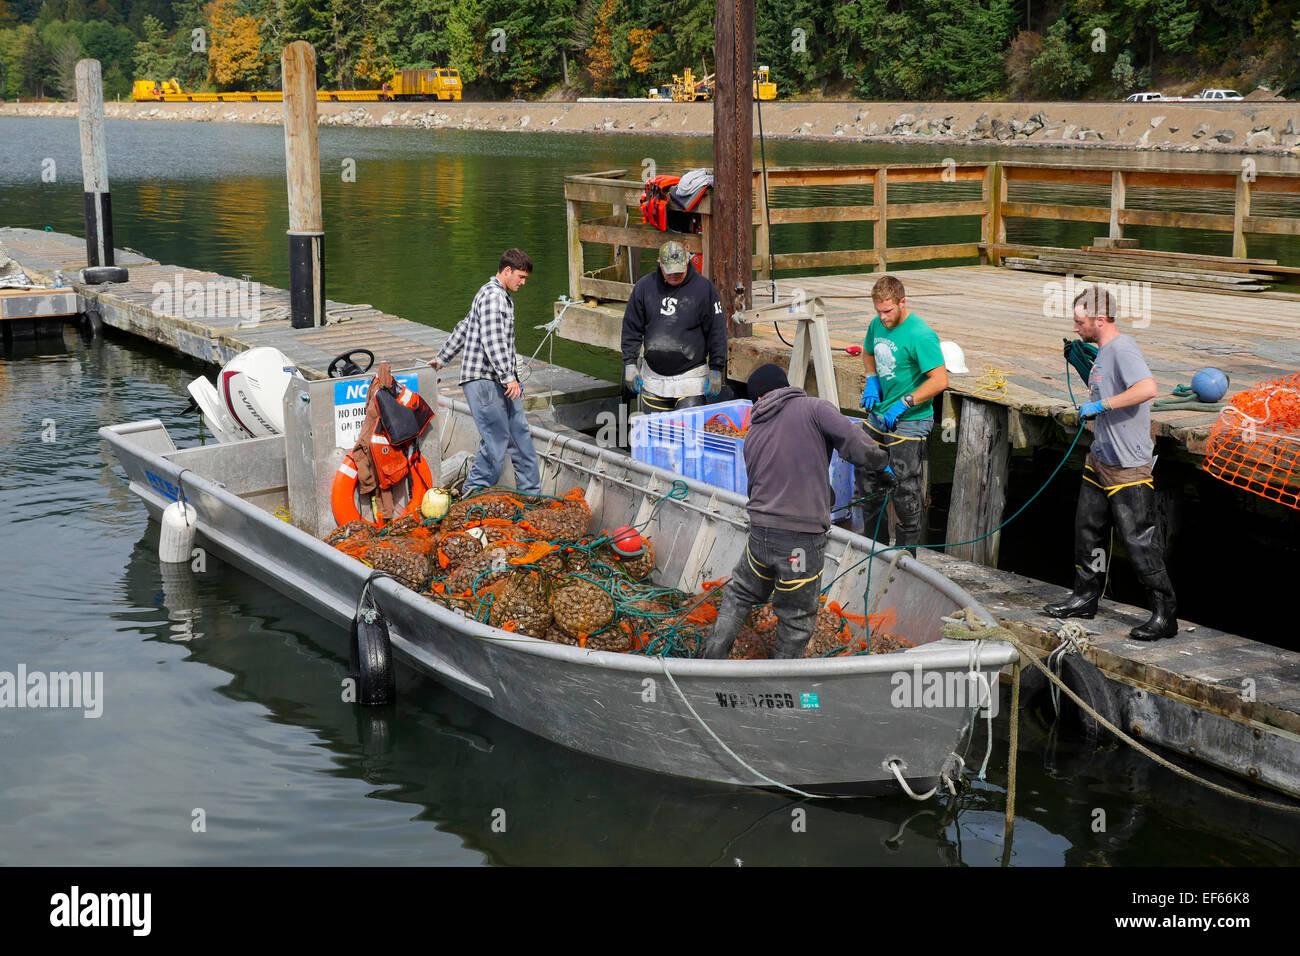 Clam, Taylor Shellfish Samish Farm Store, San Juan Islands, Puget Sound, Washington State Stock Photo